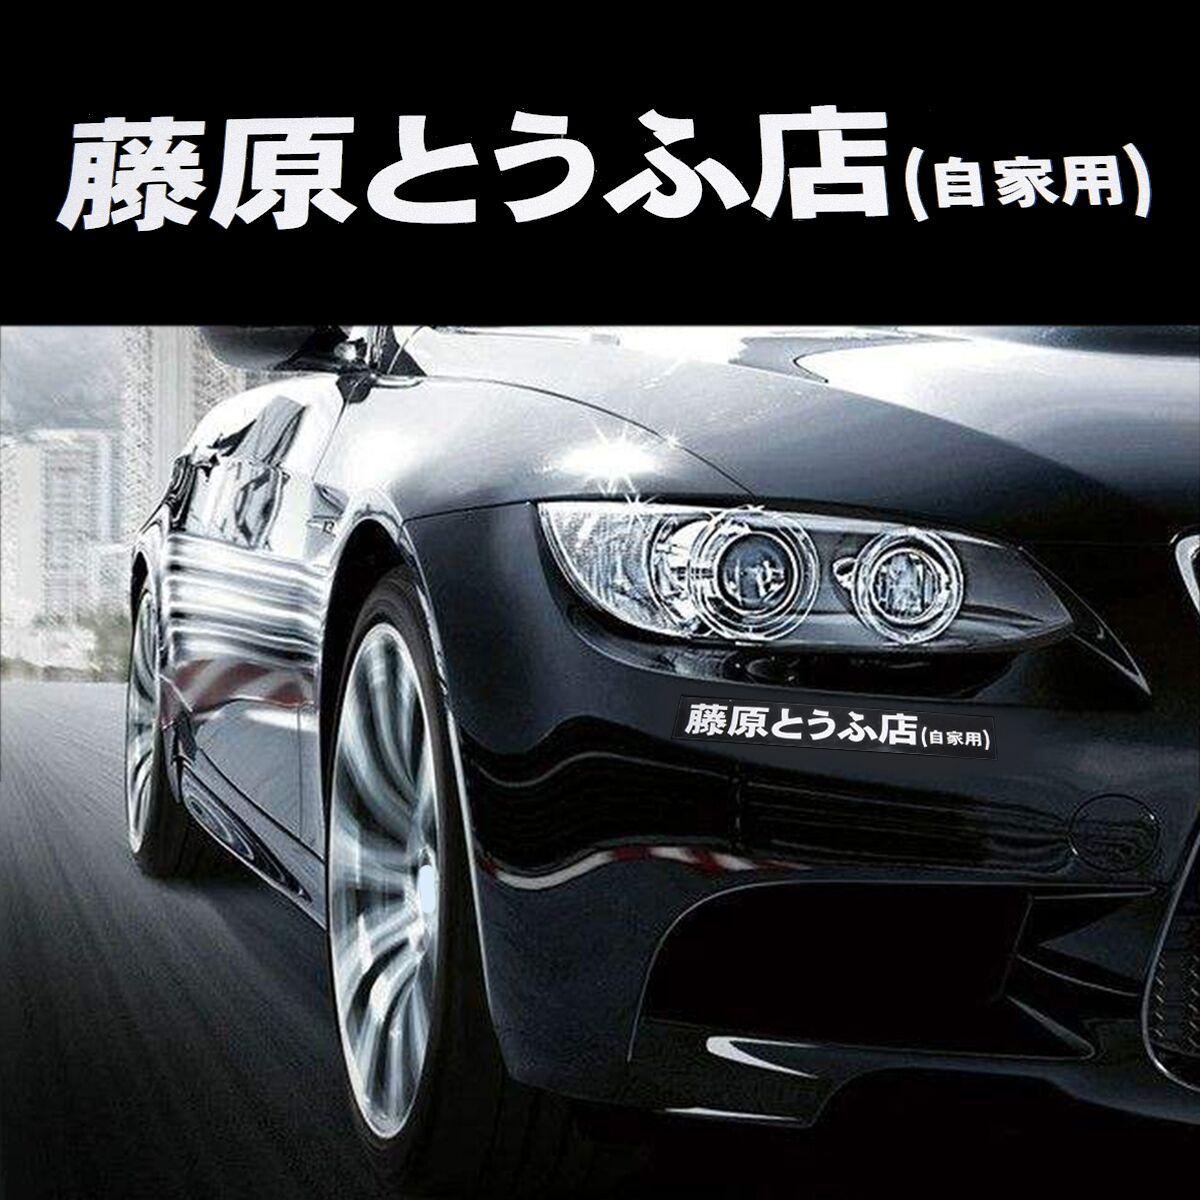 1pc Car Window Sticker Initial D Fujiwara Tofu Shop ...